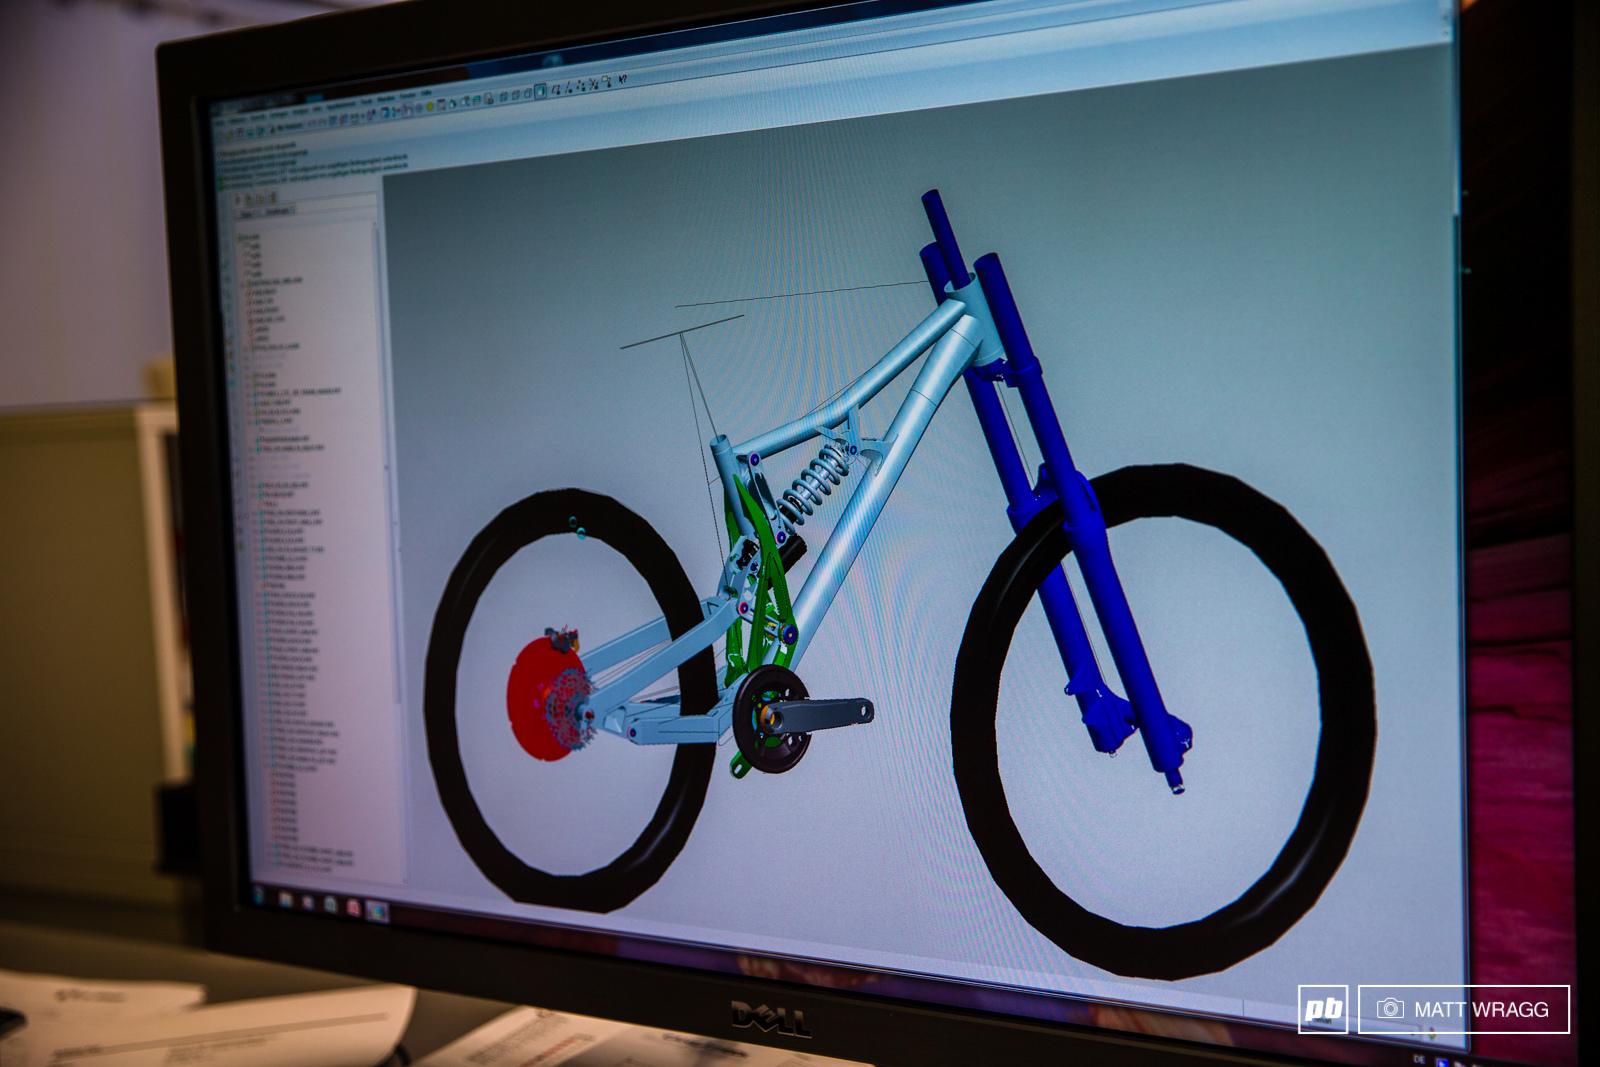 Michael Prell of Cube bikes